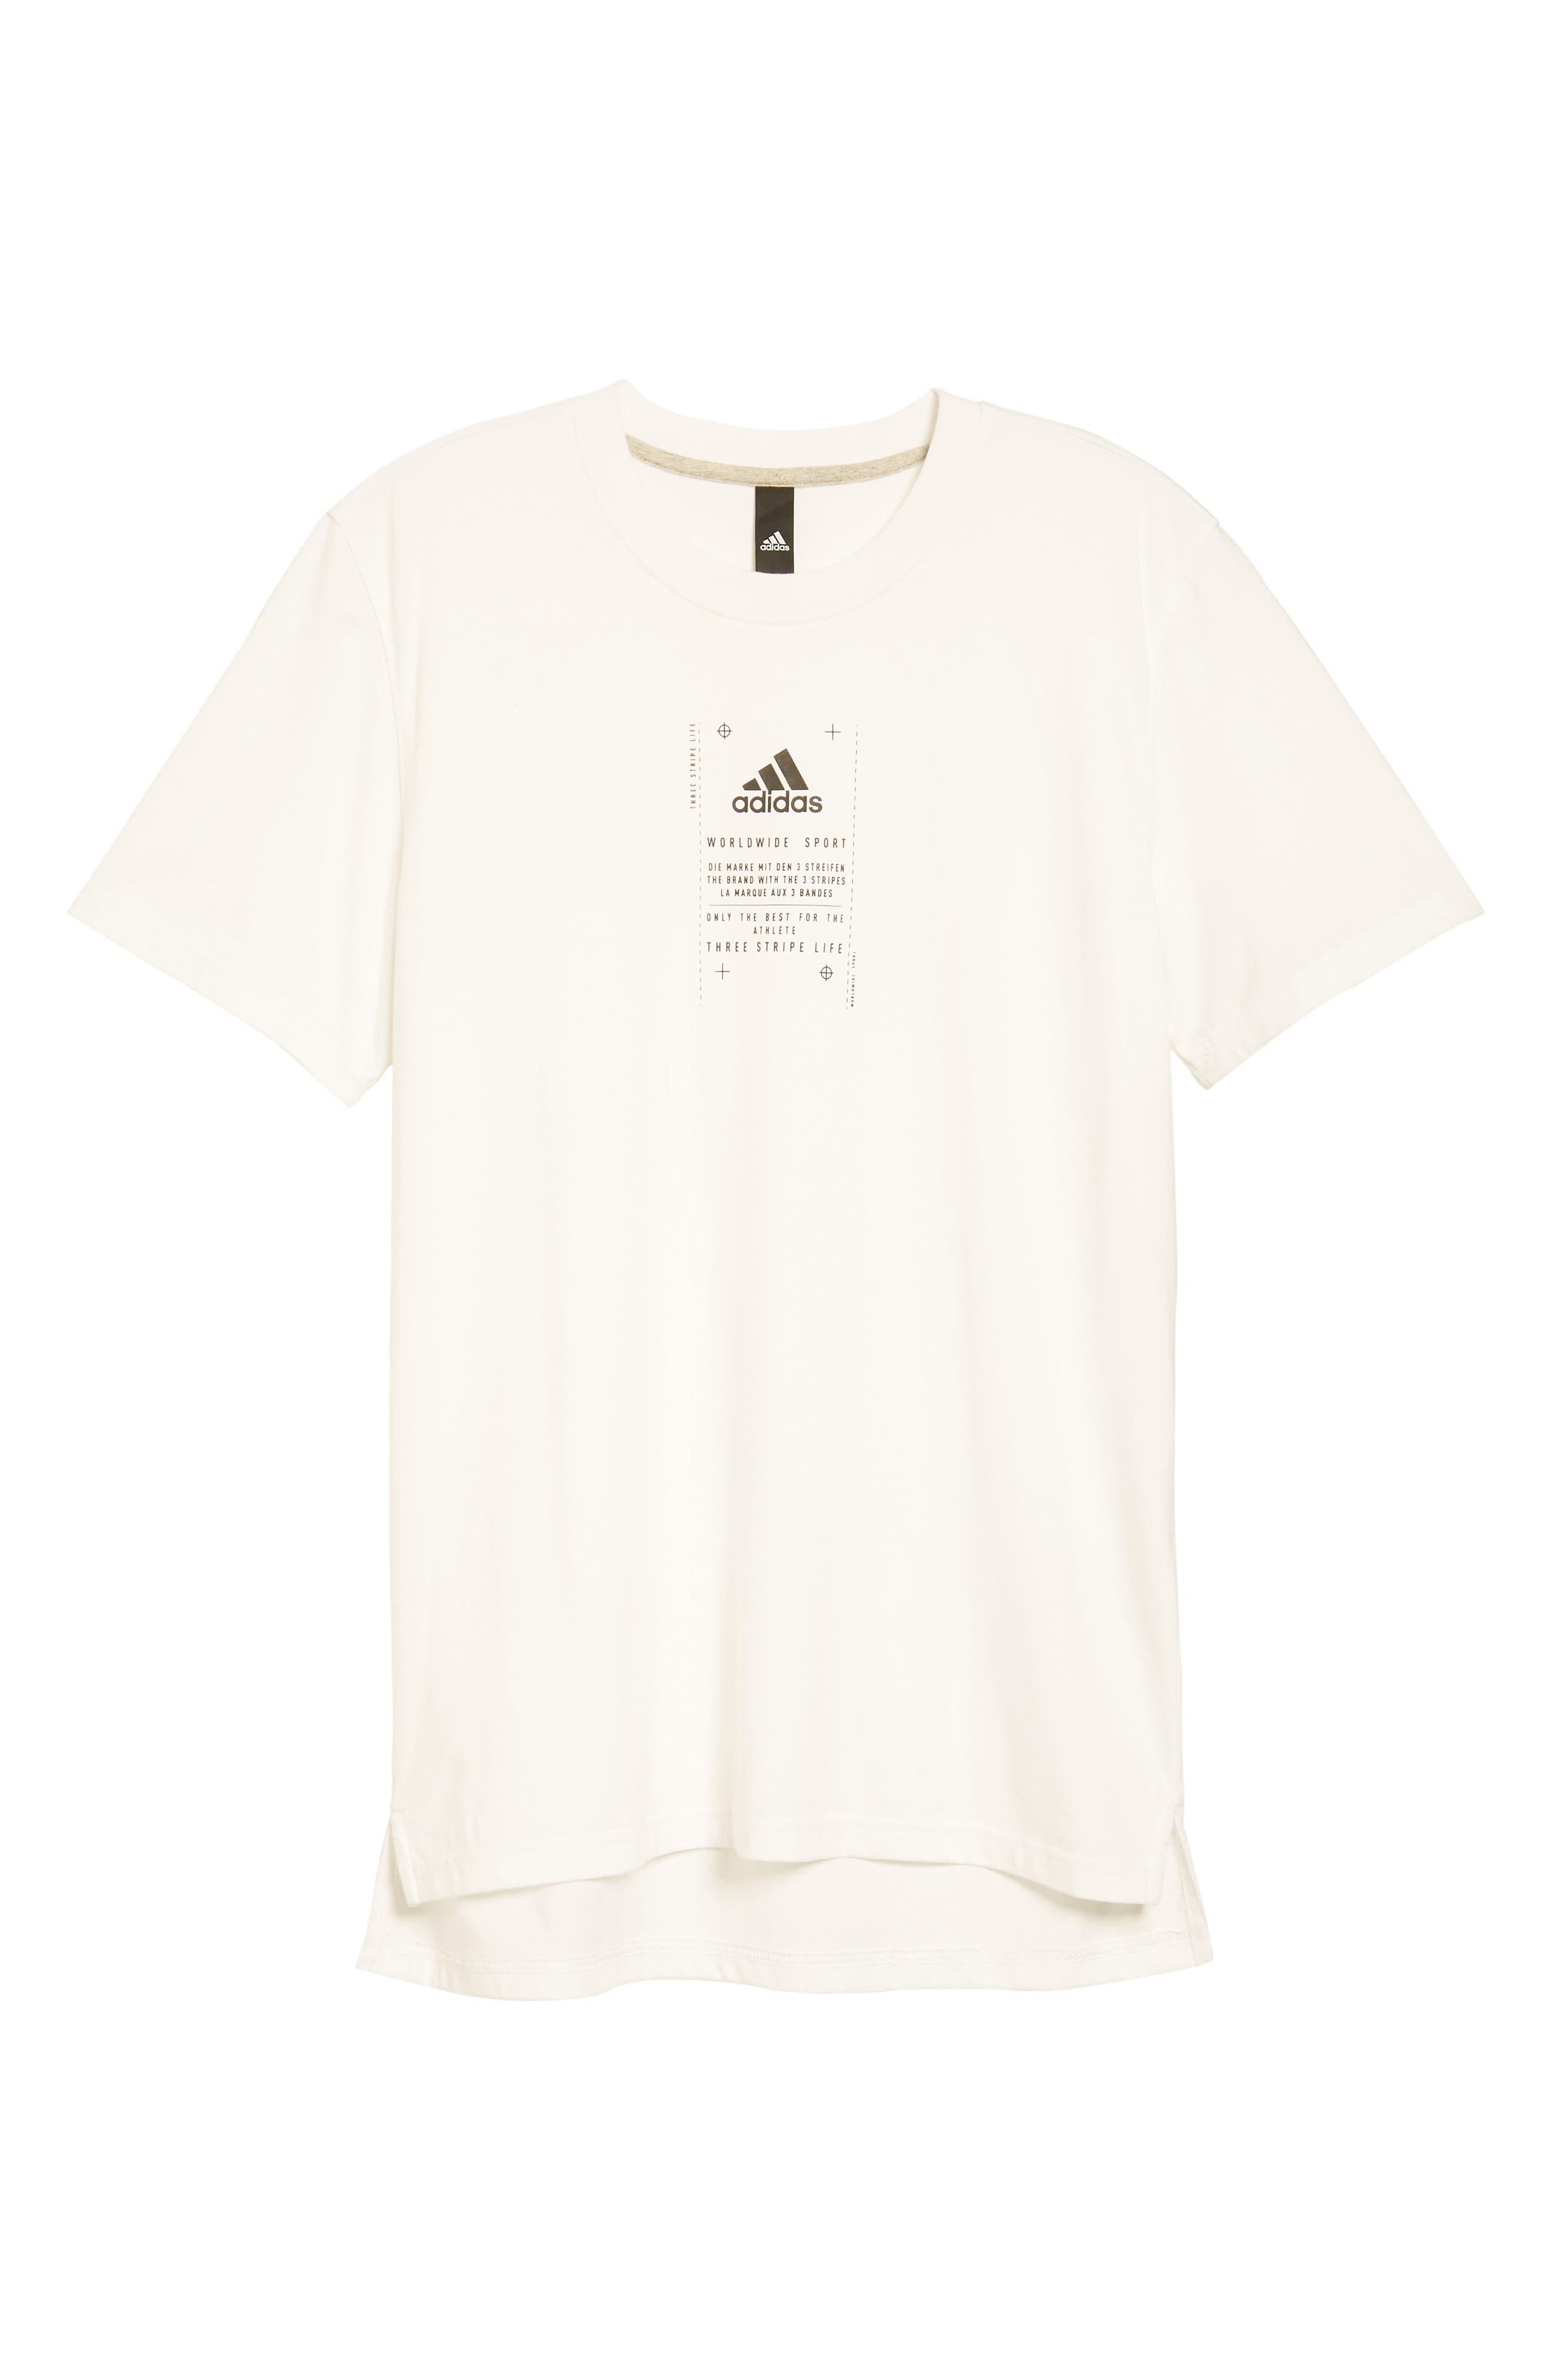 BOS Label T-Shirt,                             Alternate thumbnail 4, color,                             White / Black